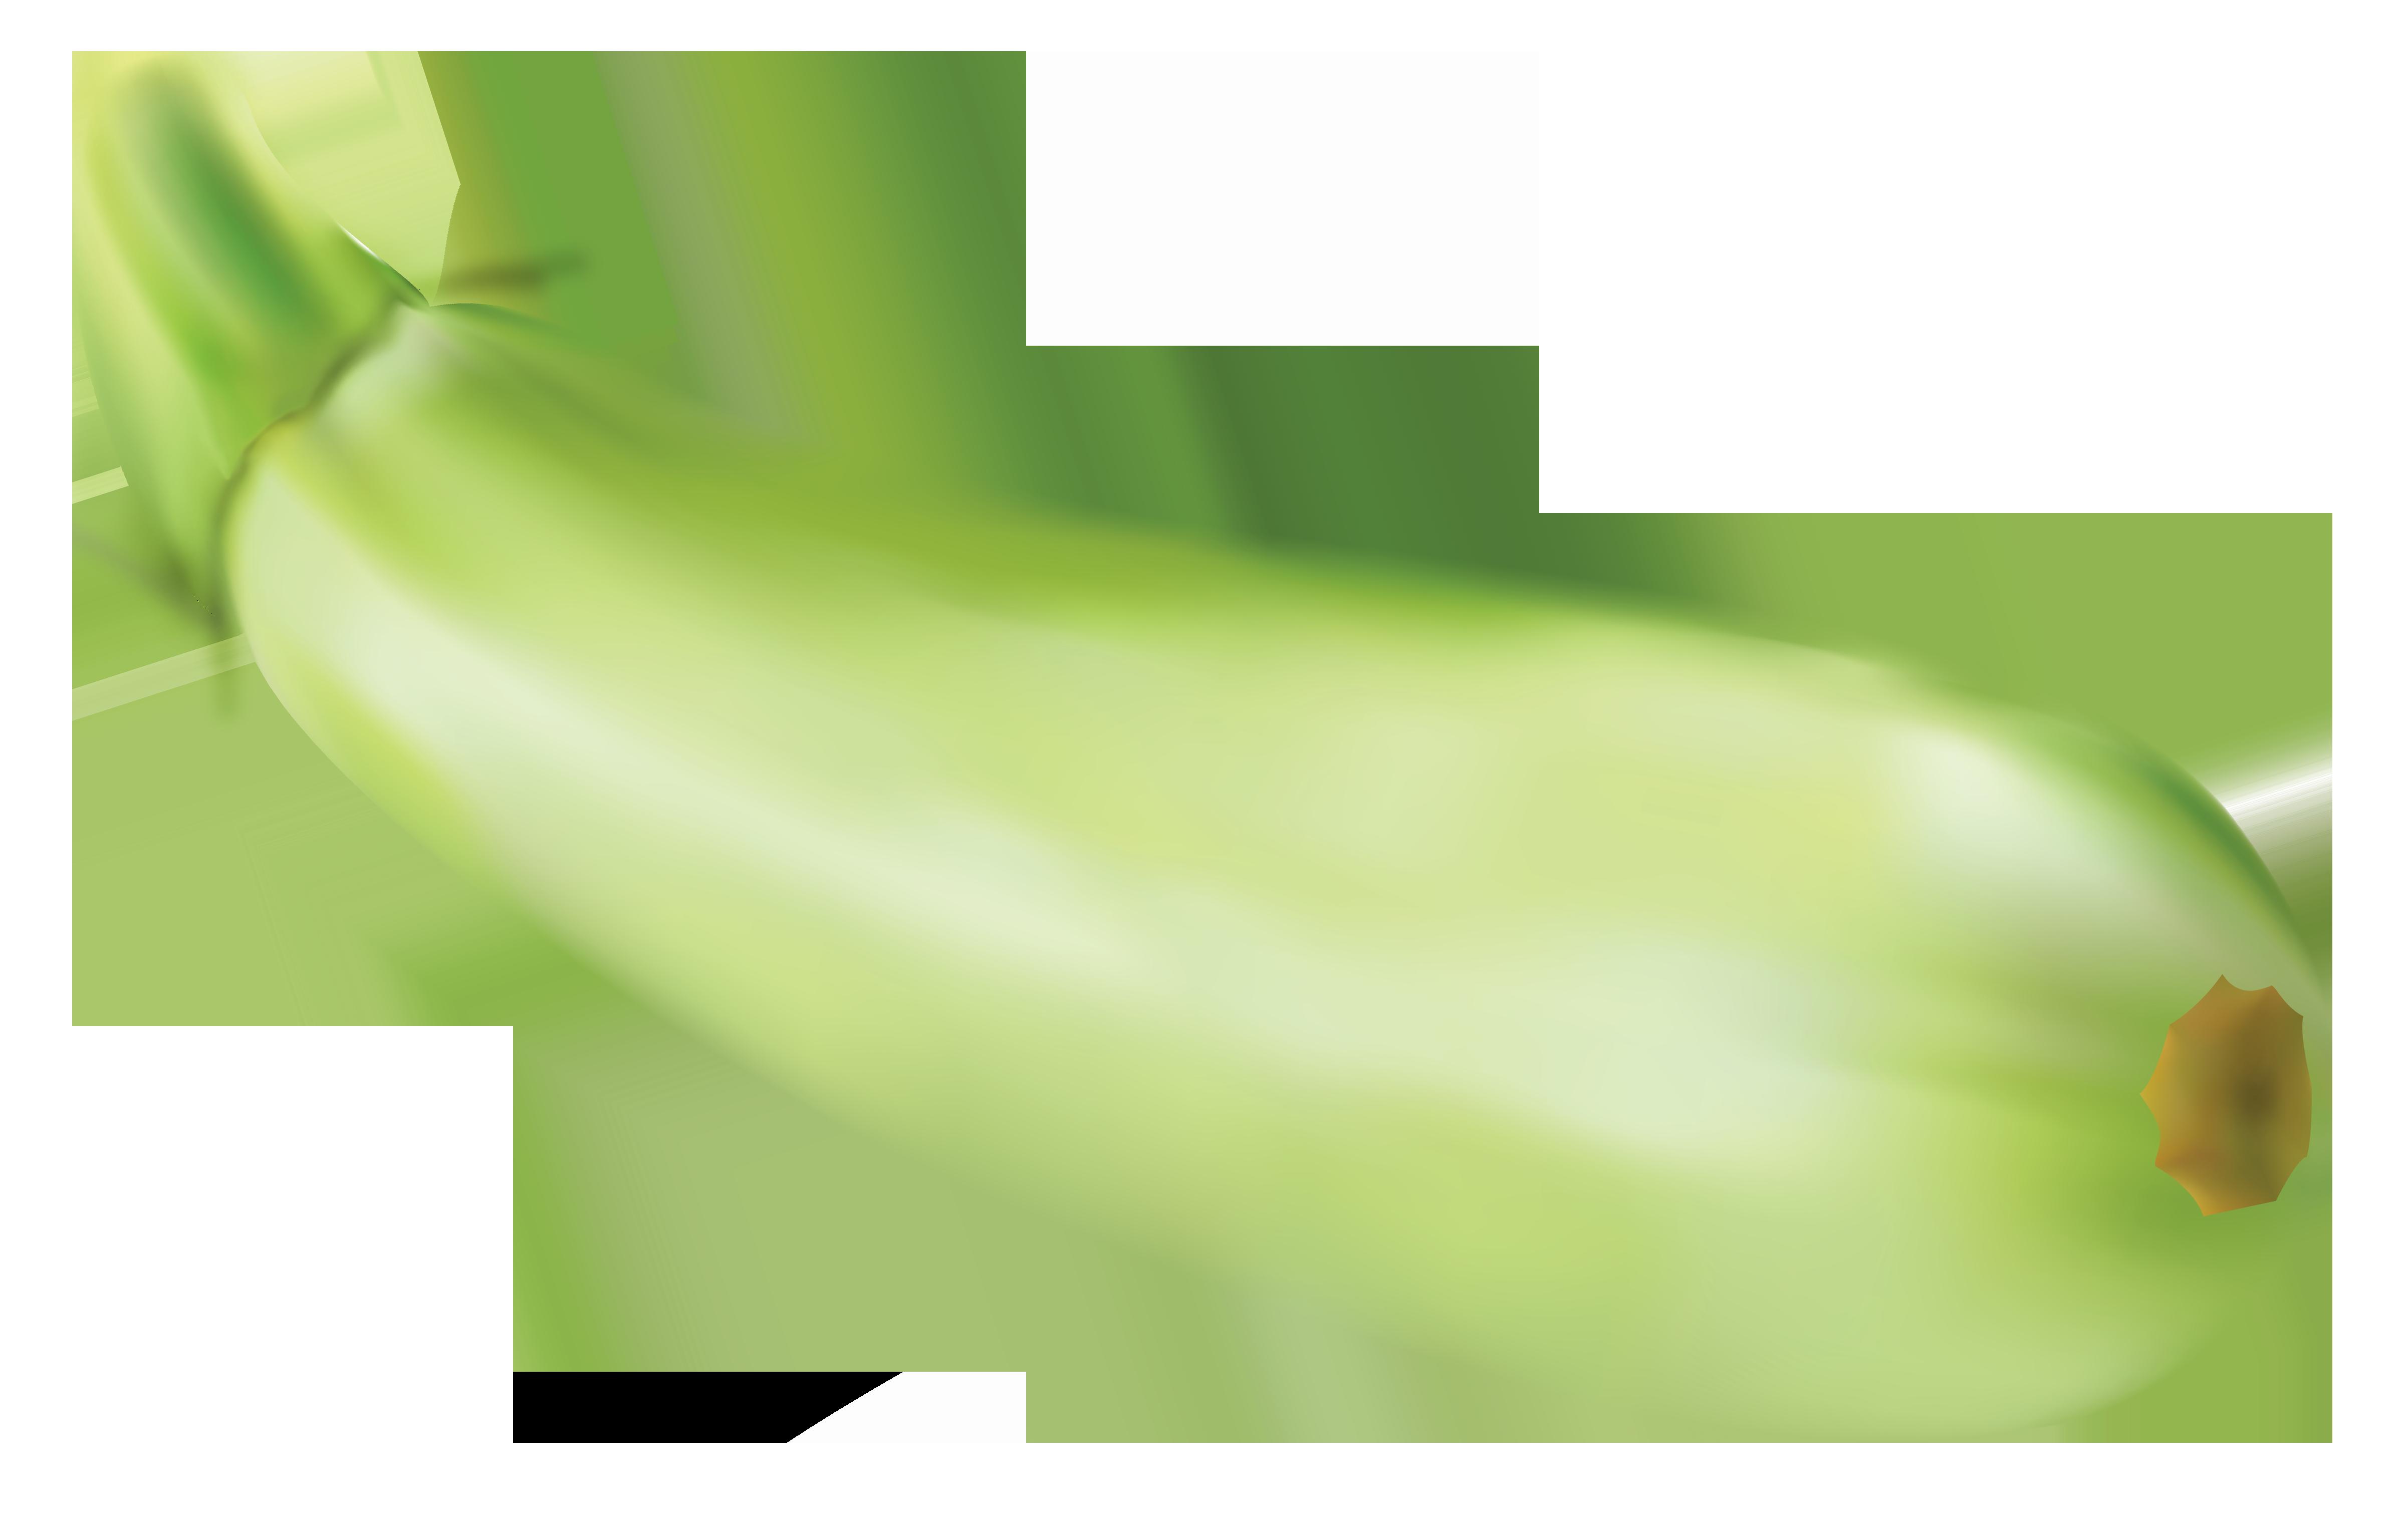 Zucchini clipart Zucchini Zucchini clipart clipart clipartfest